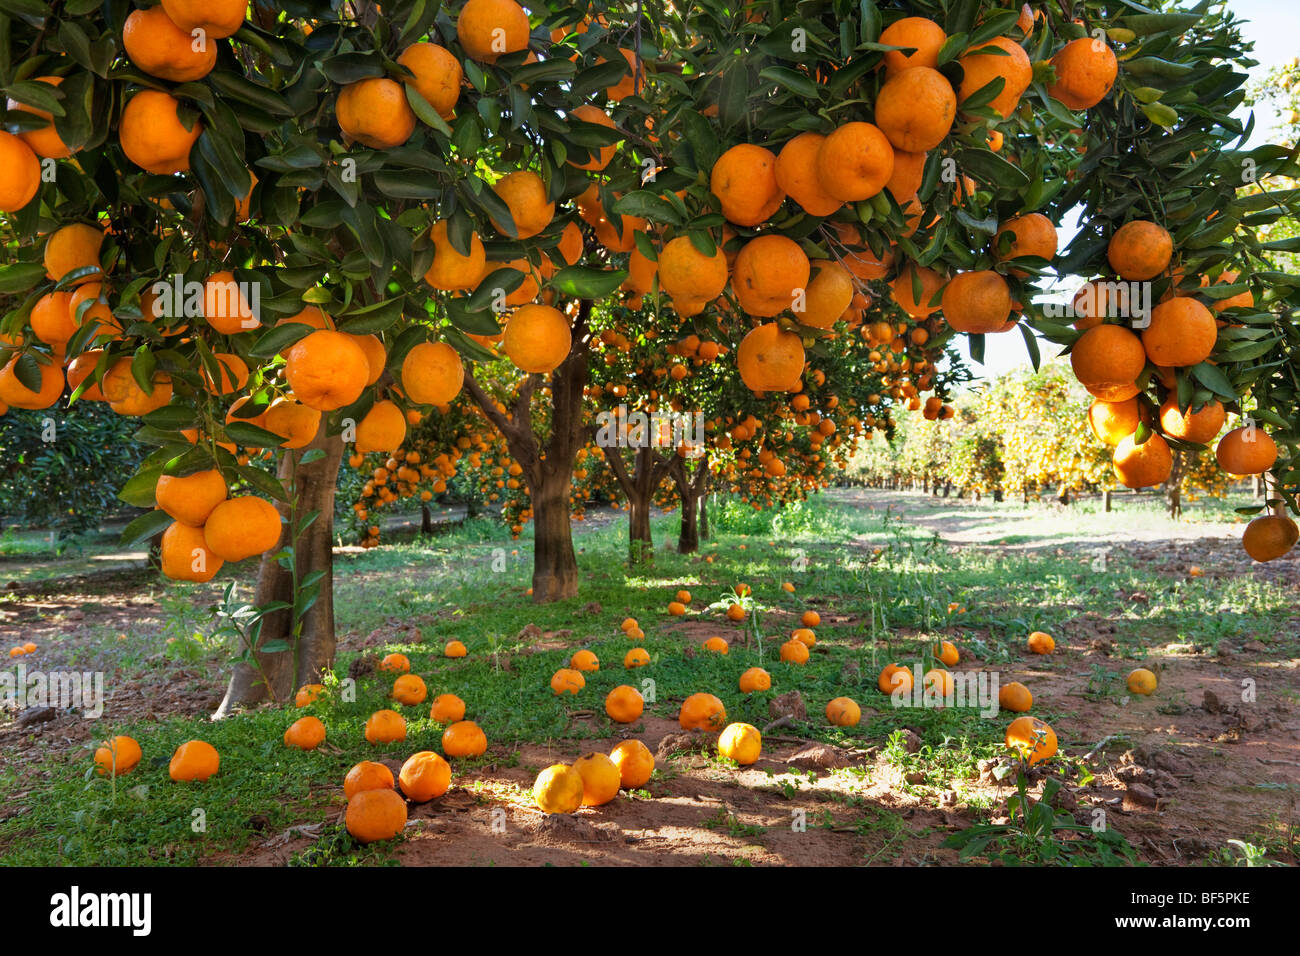 Fruits Orange laden arbres dans un verger Photo Stock